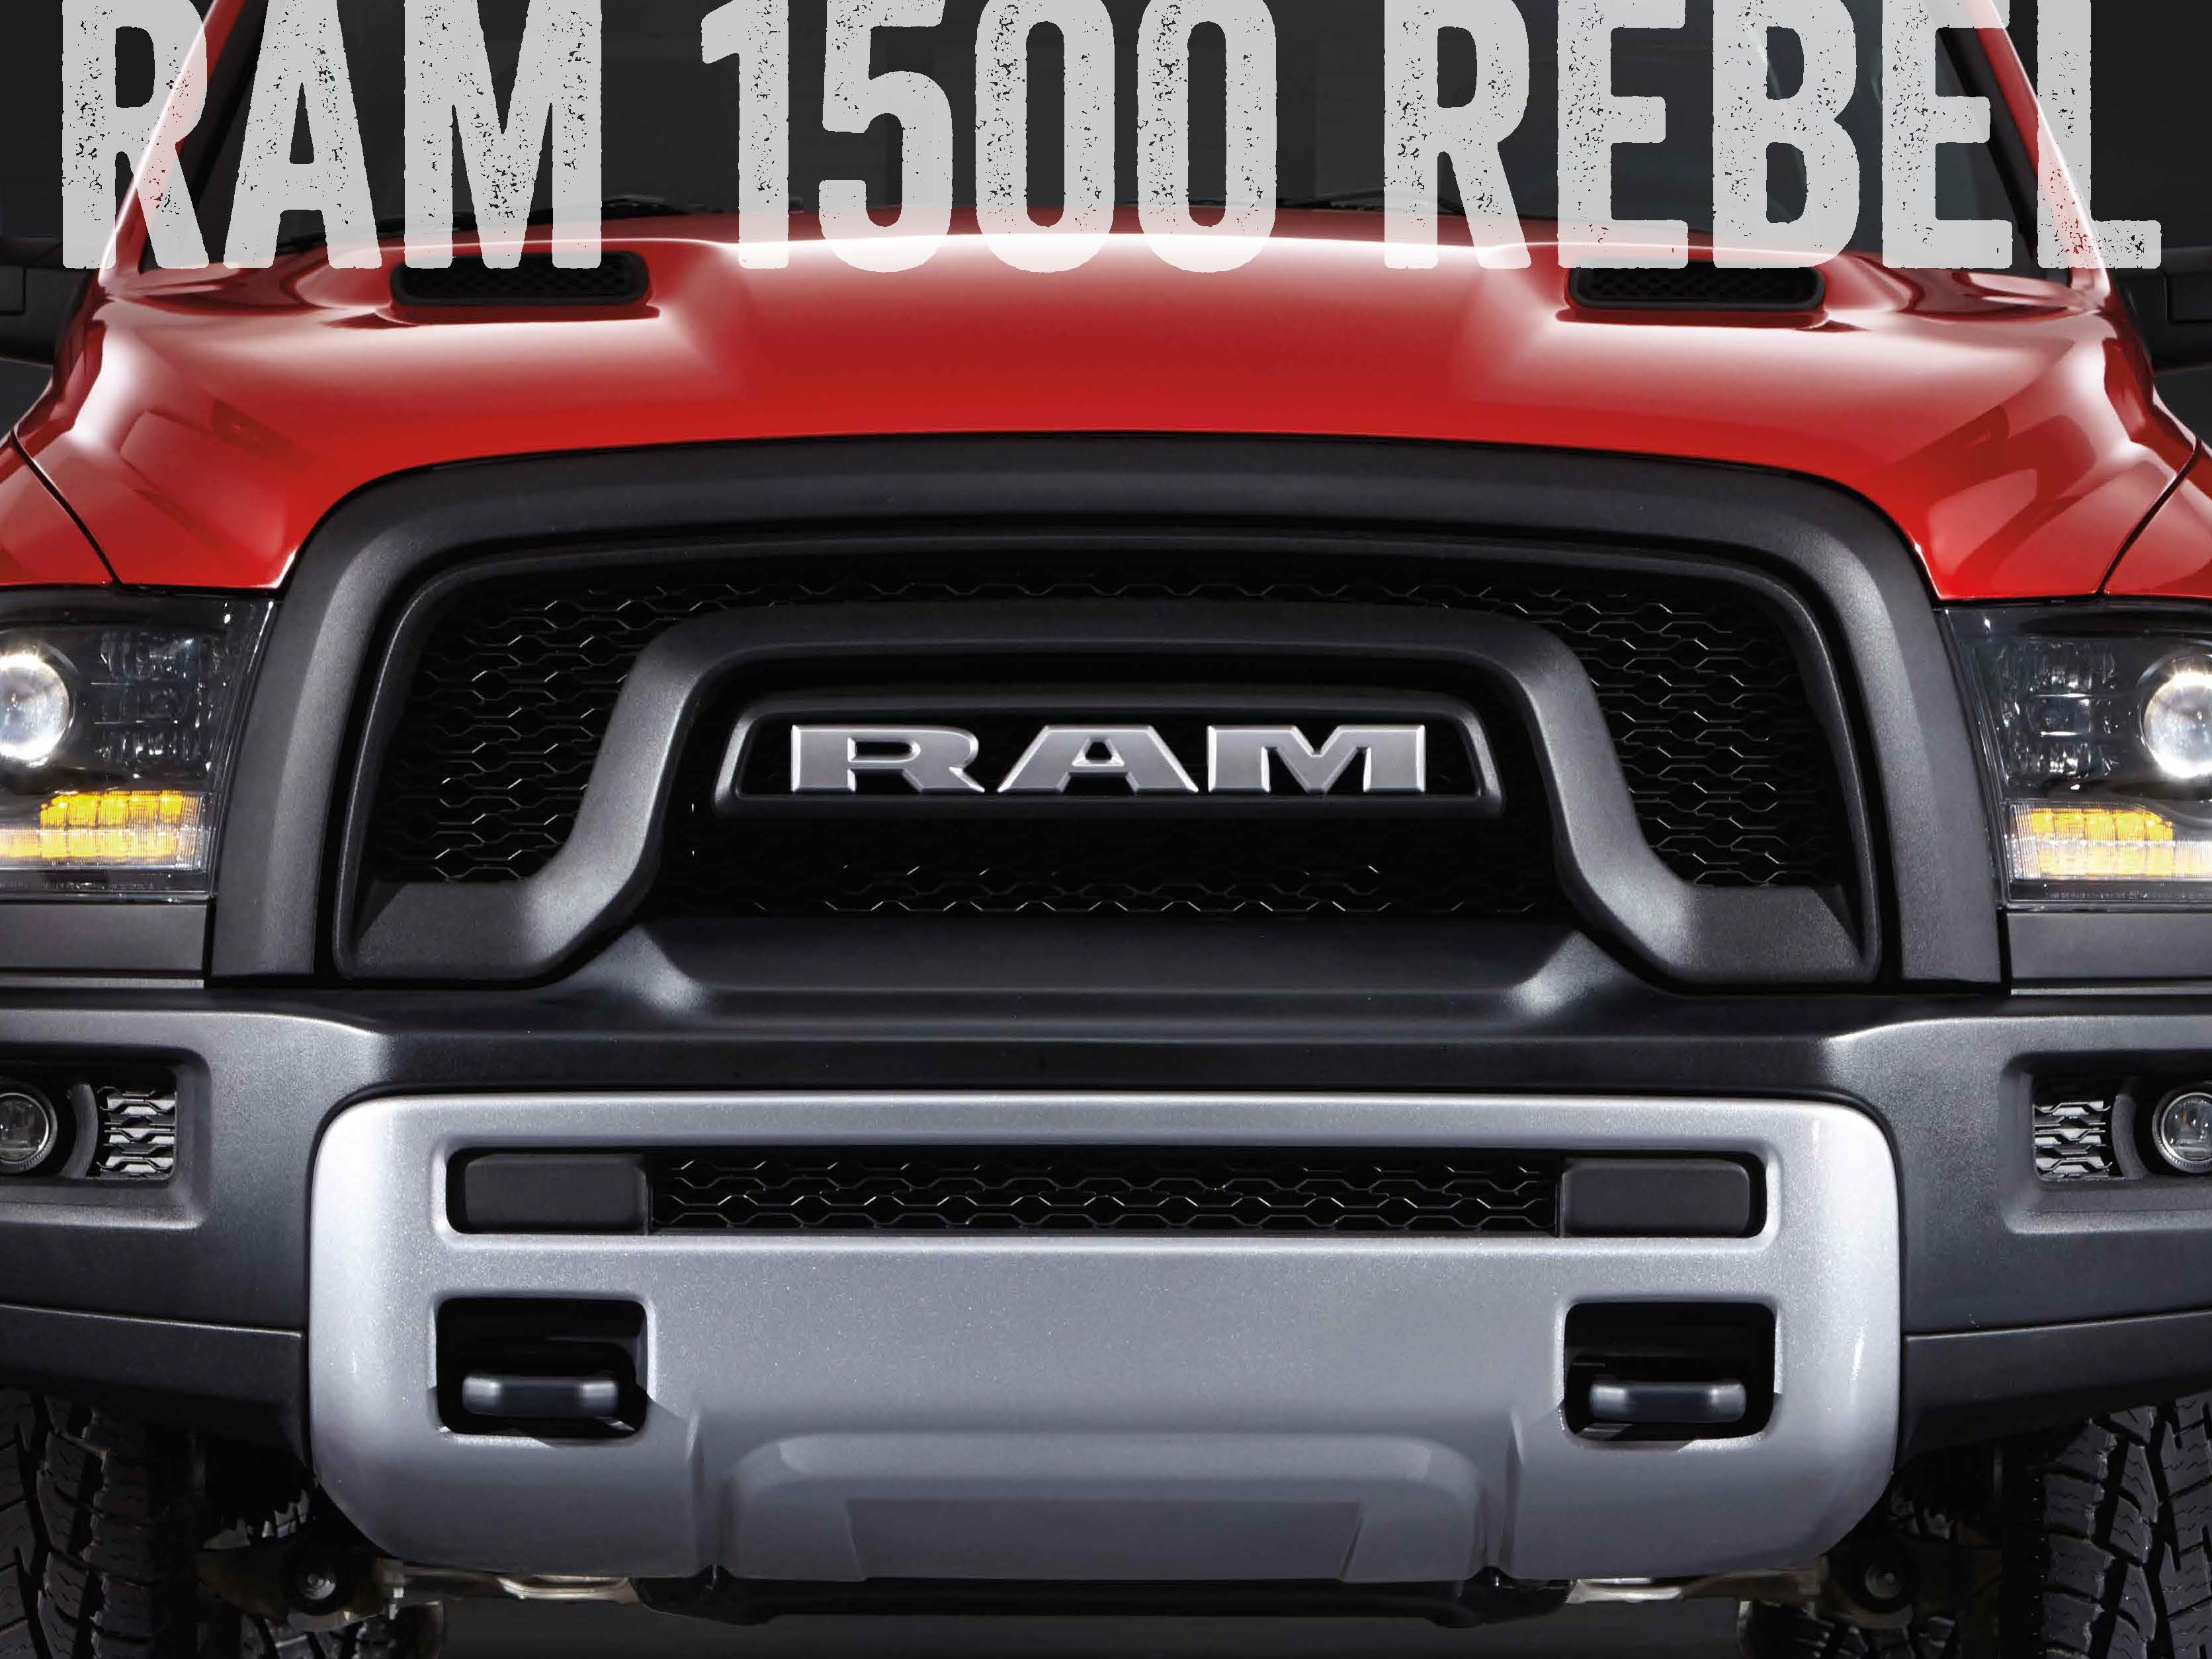 All New RAM 1500 Rebel for Sale RAM 1500 Dealer in Anderson IN